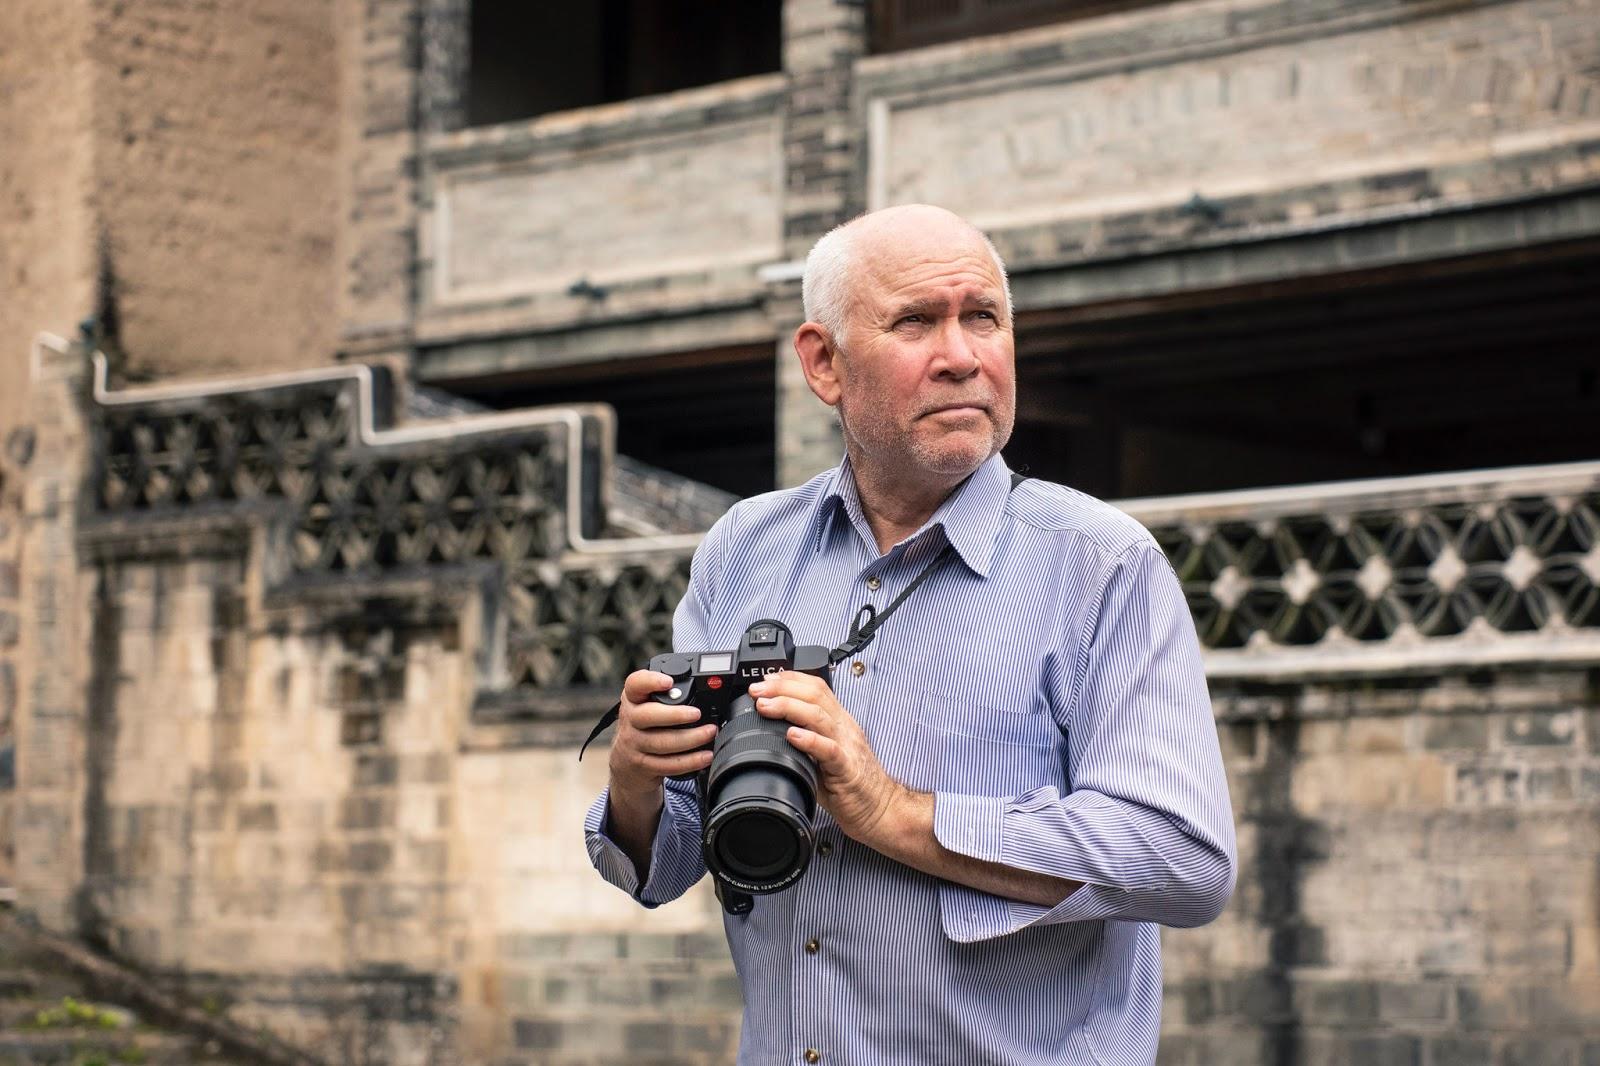 Steve McCurry, China